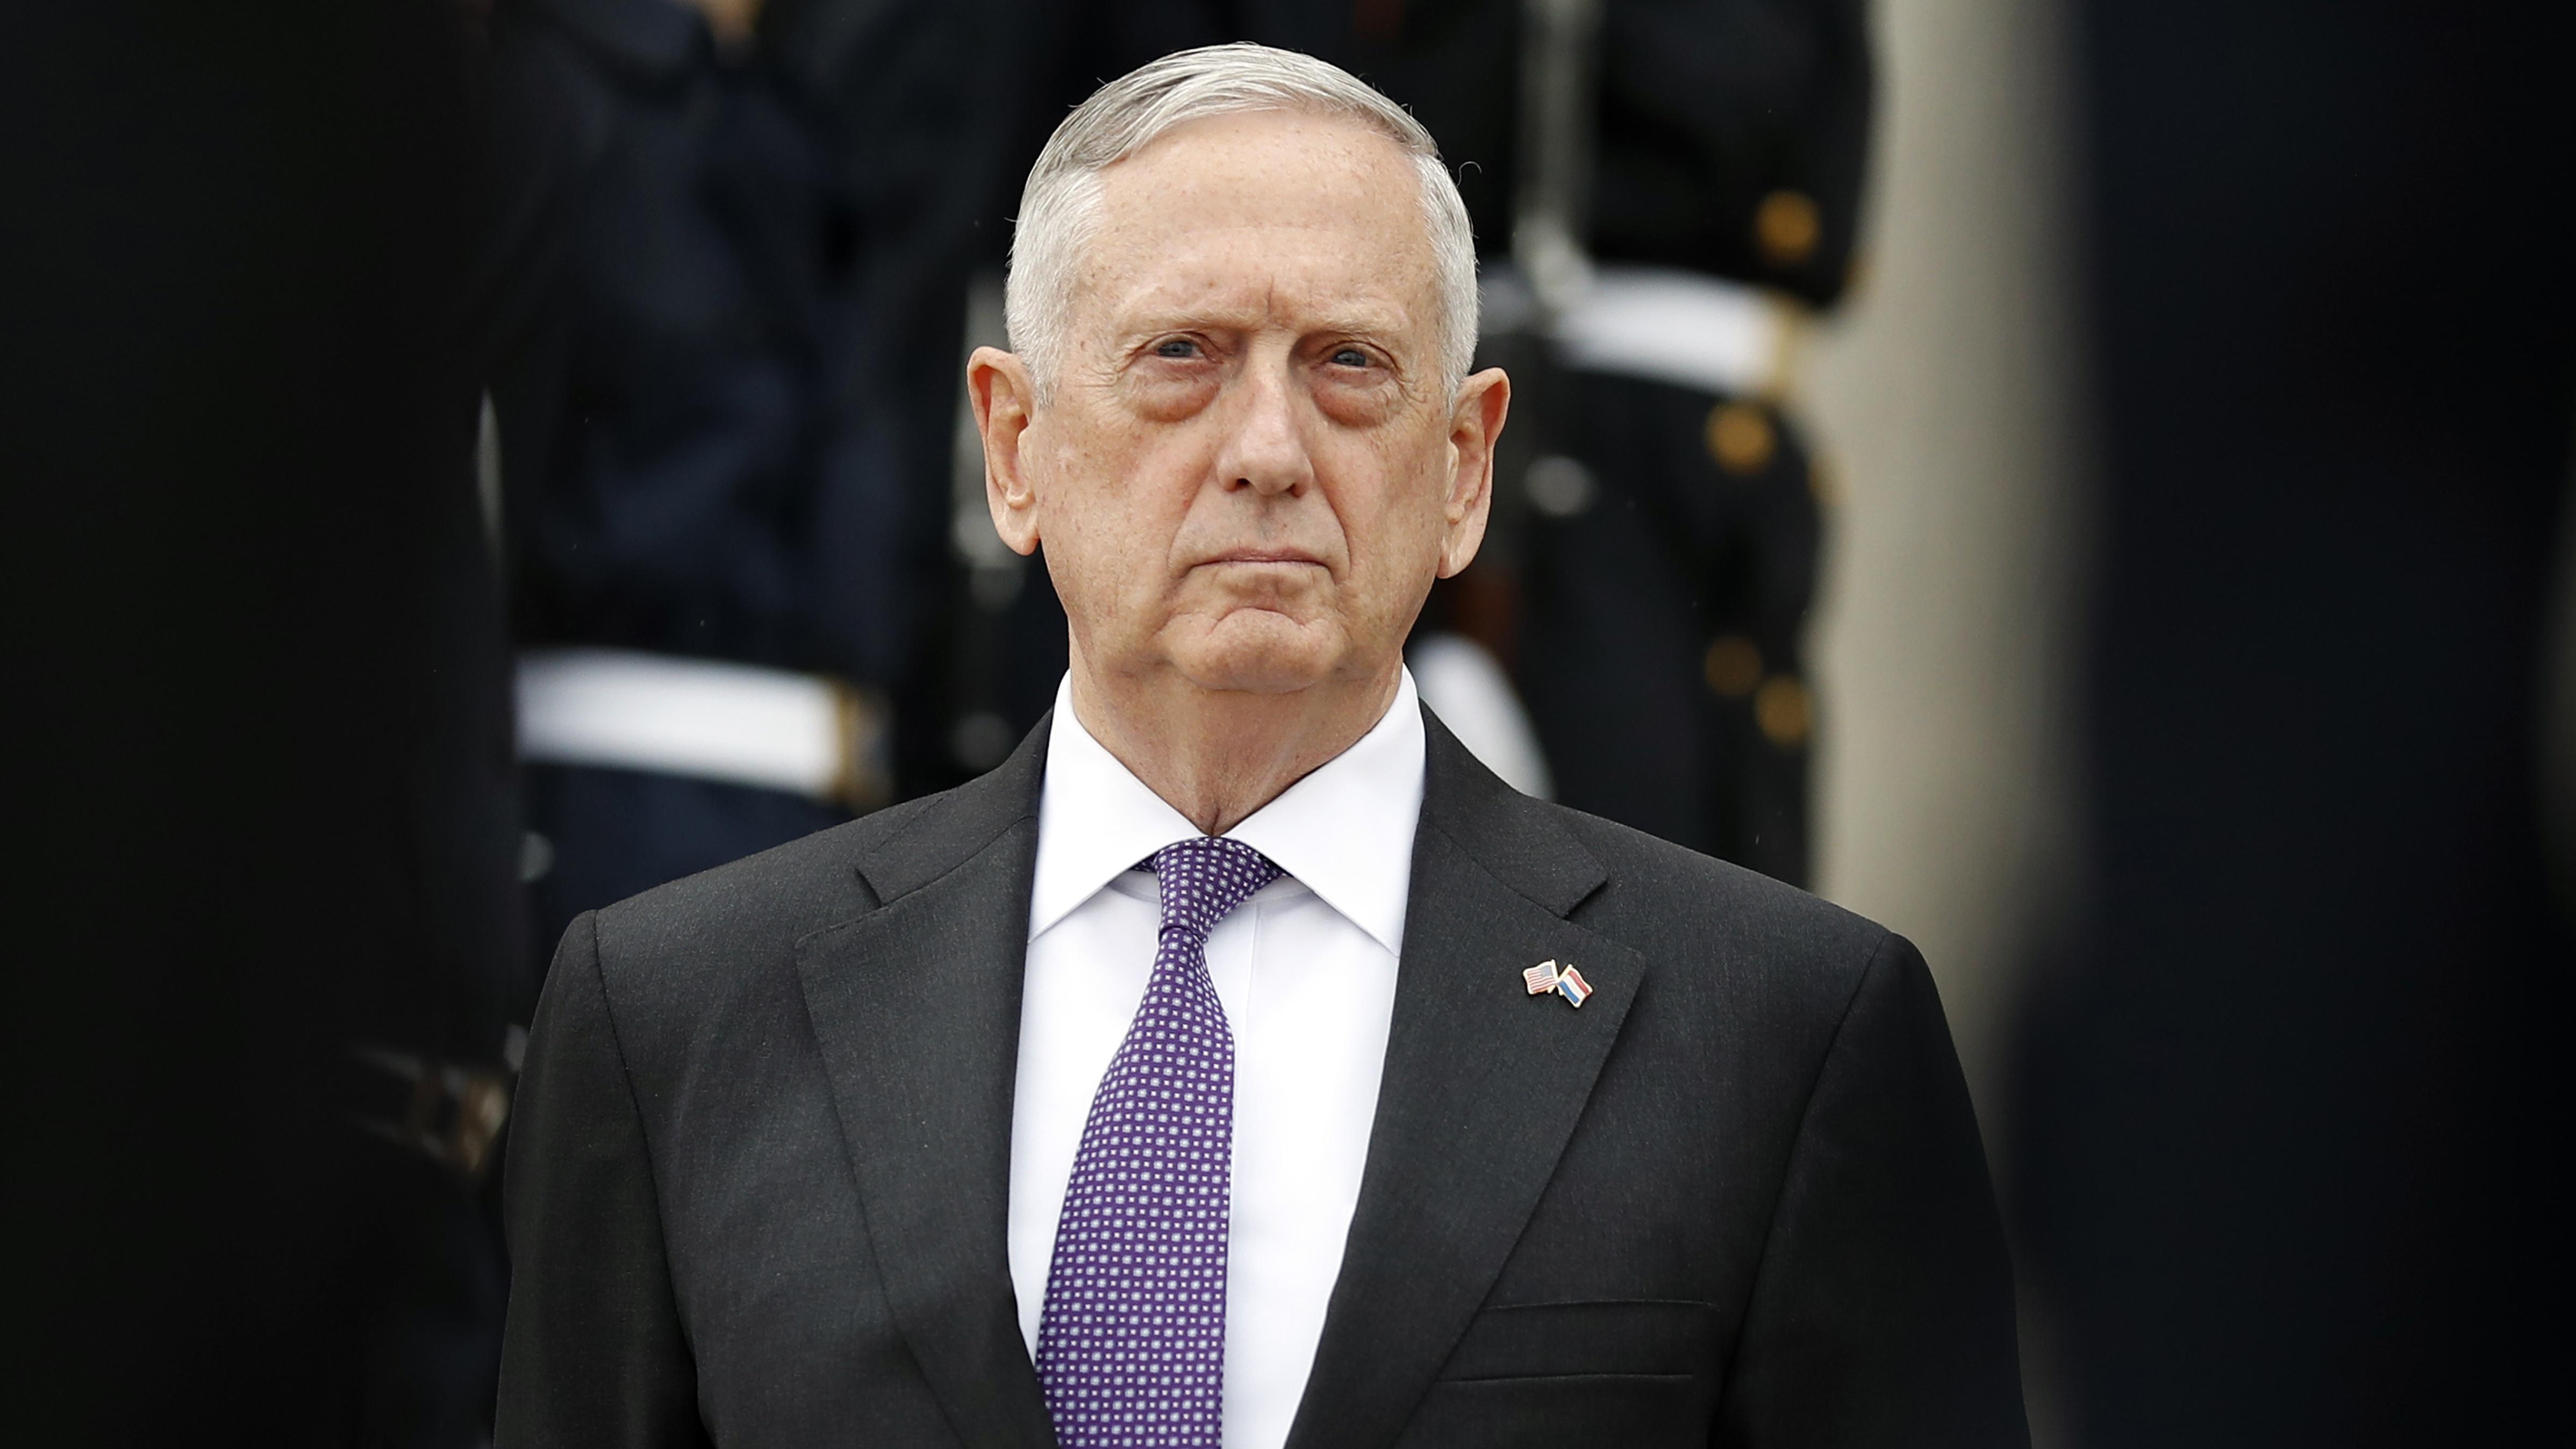 Mattis: Still room for diplomatic solution with N.Korea